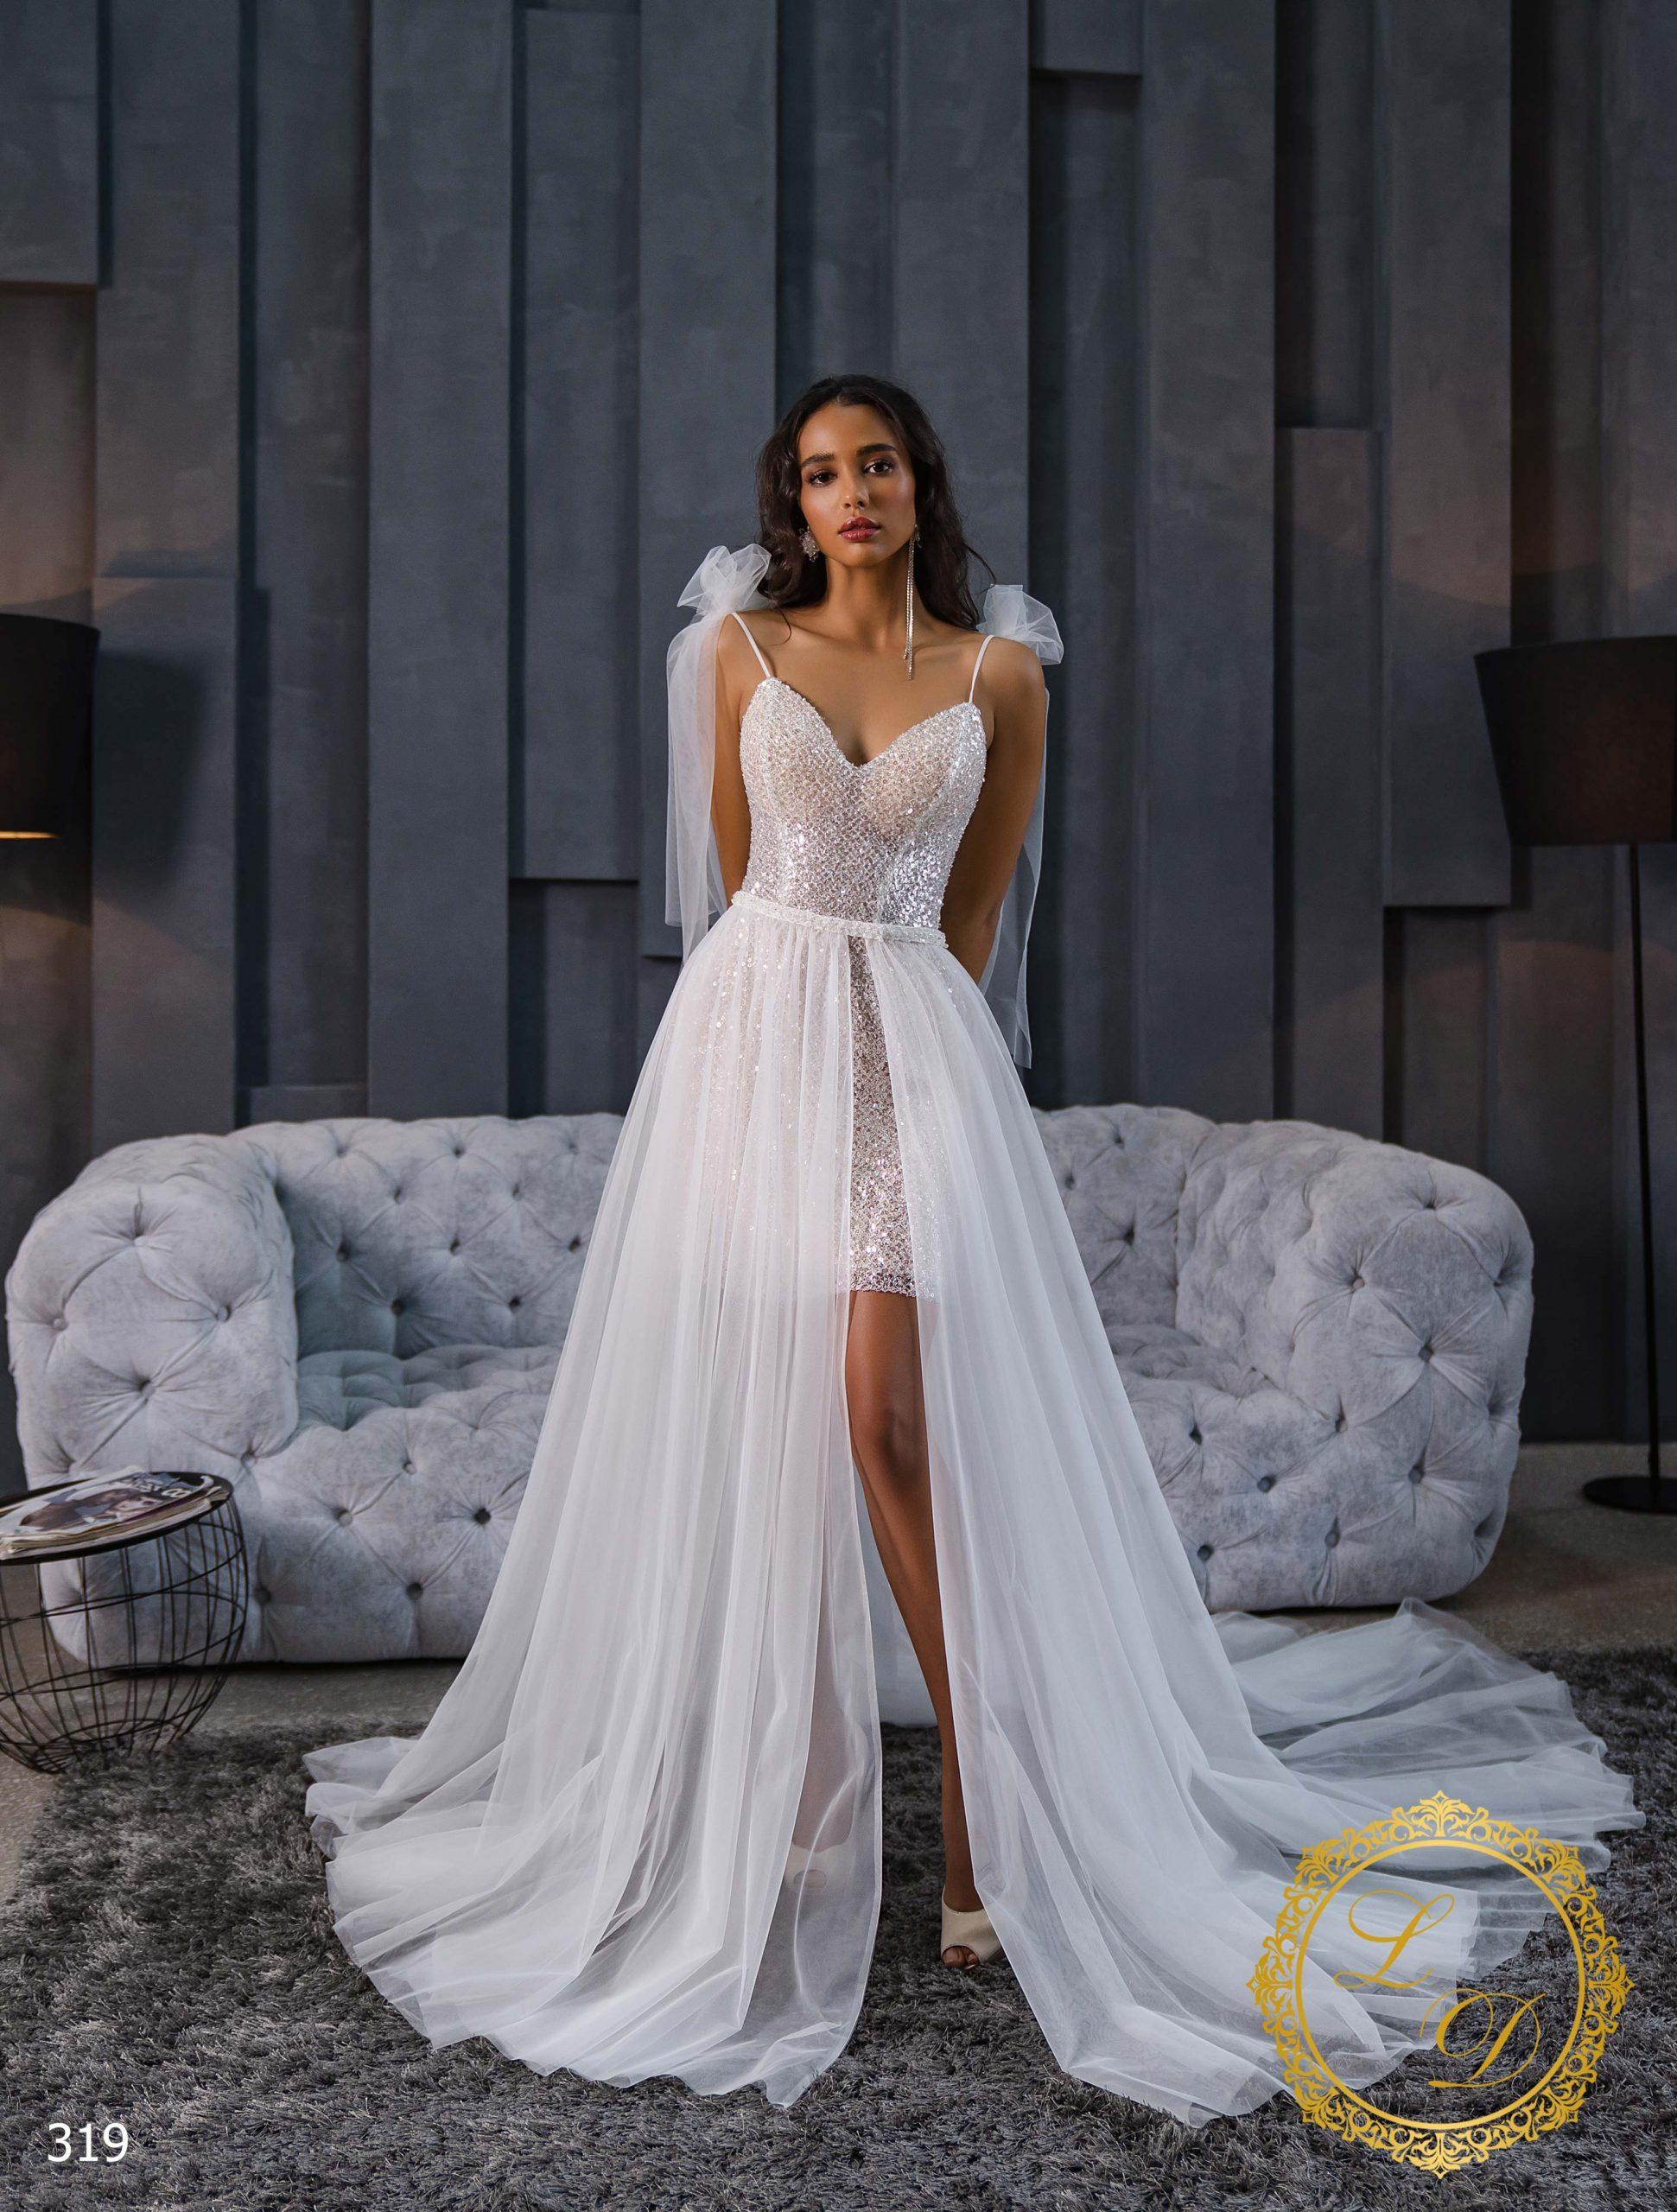 Wedding Dress Lady Di 319-1